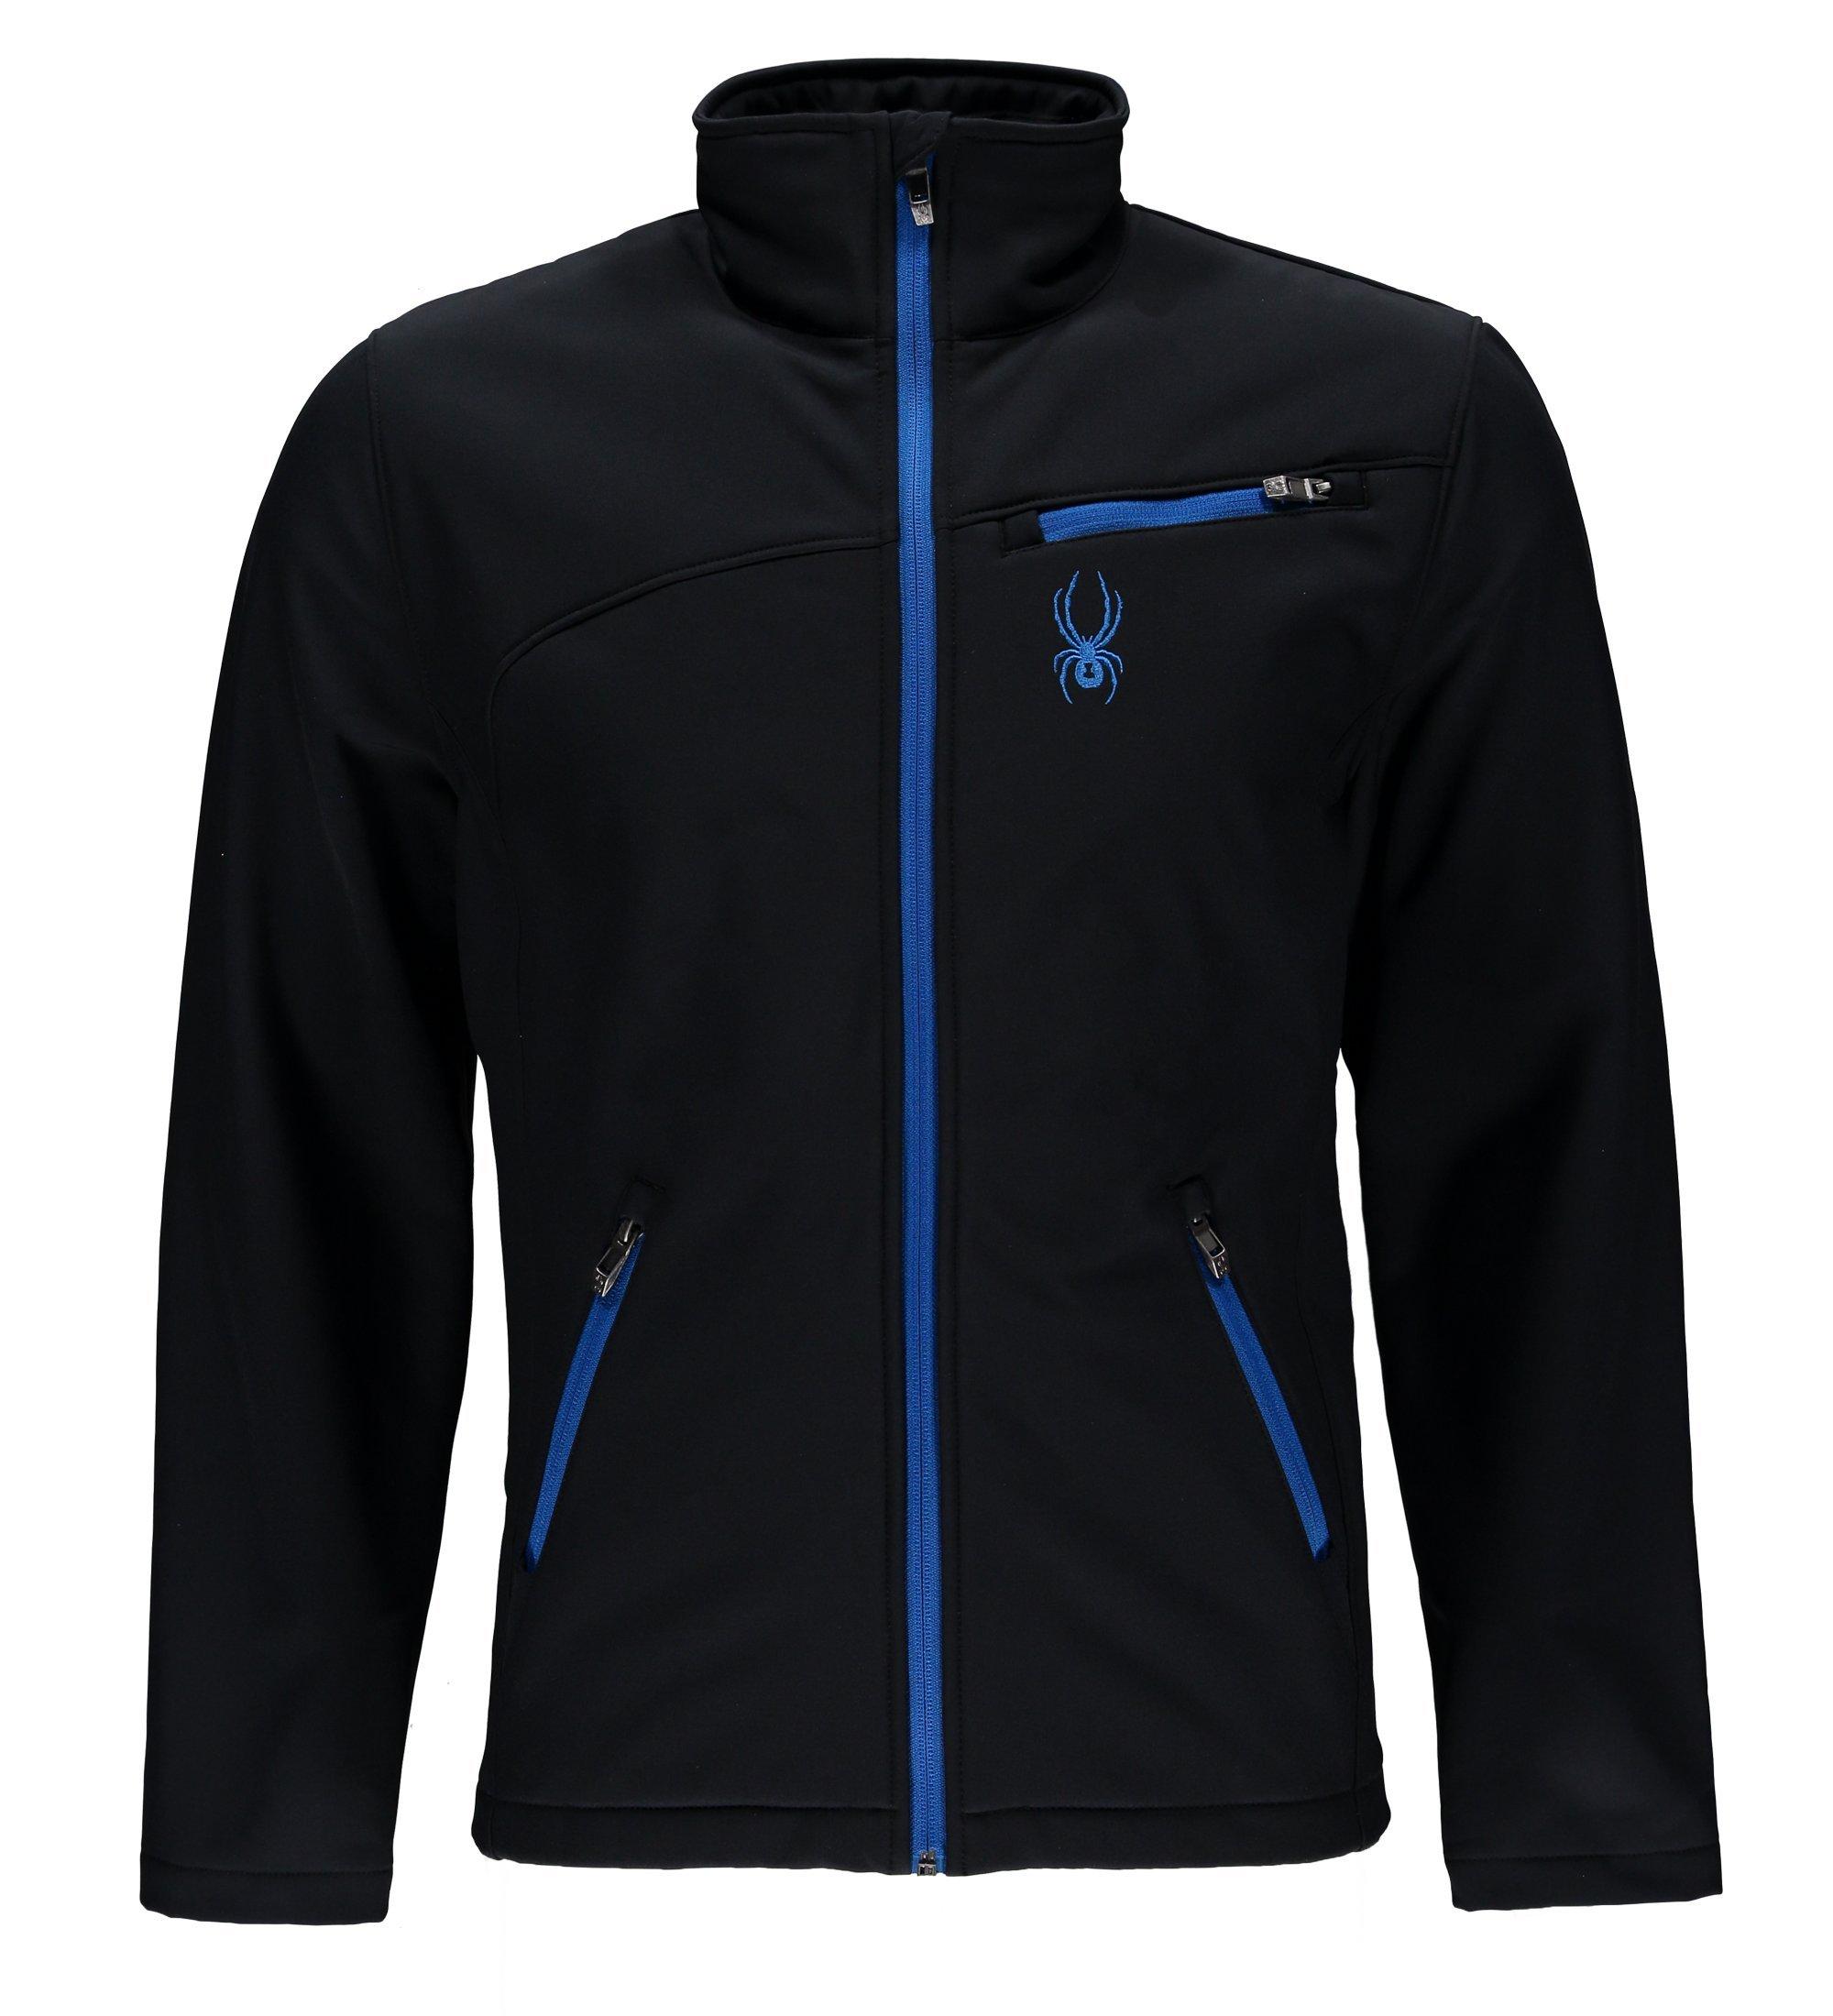 Spyder Men's Softshell Jacket, Black/Stratos Blue, XX-Large